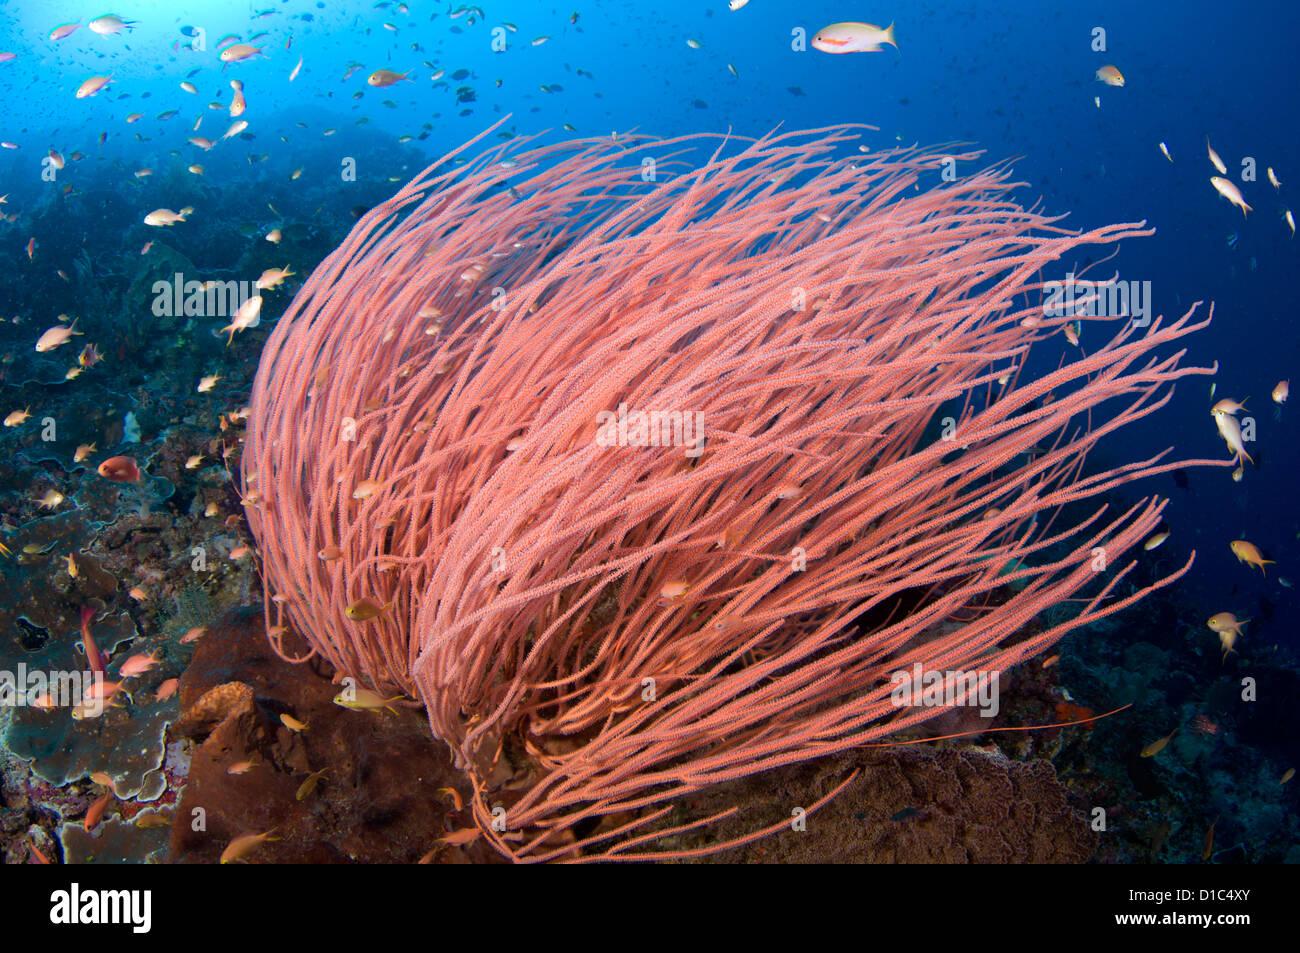 Anthias hover over bright red seawhips, Ellisella sp., Spice Islands, Maluku Region, Halmahera, Indonesia, Pacific Stock Photo